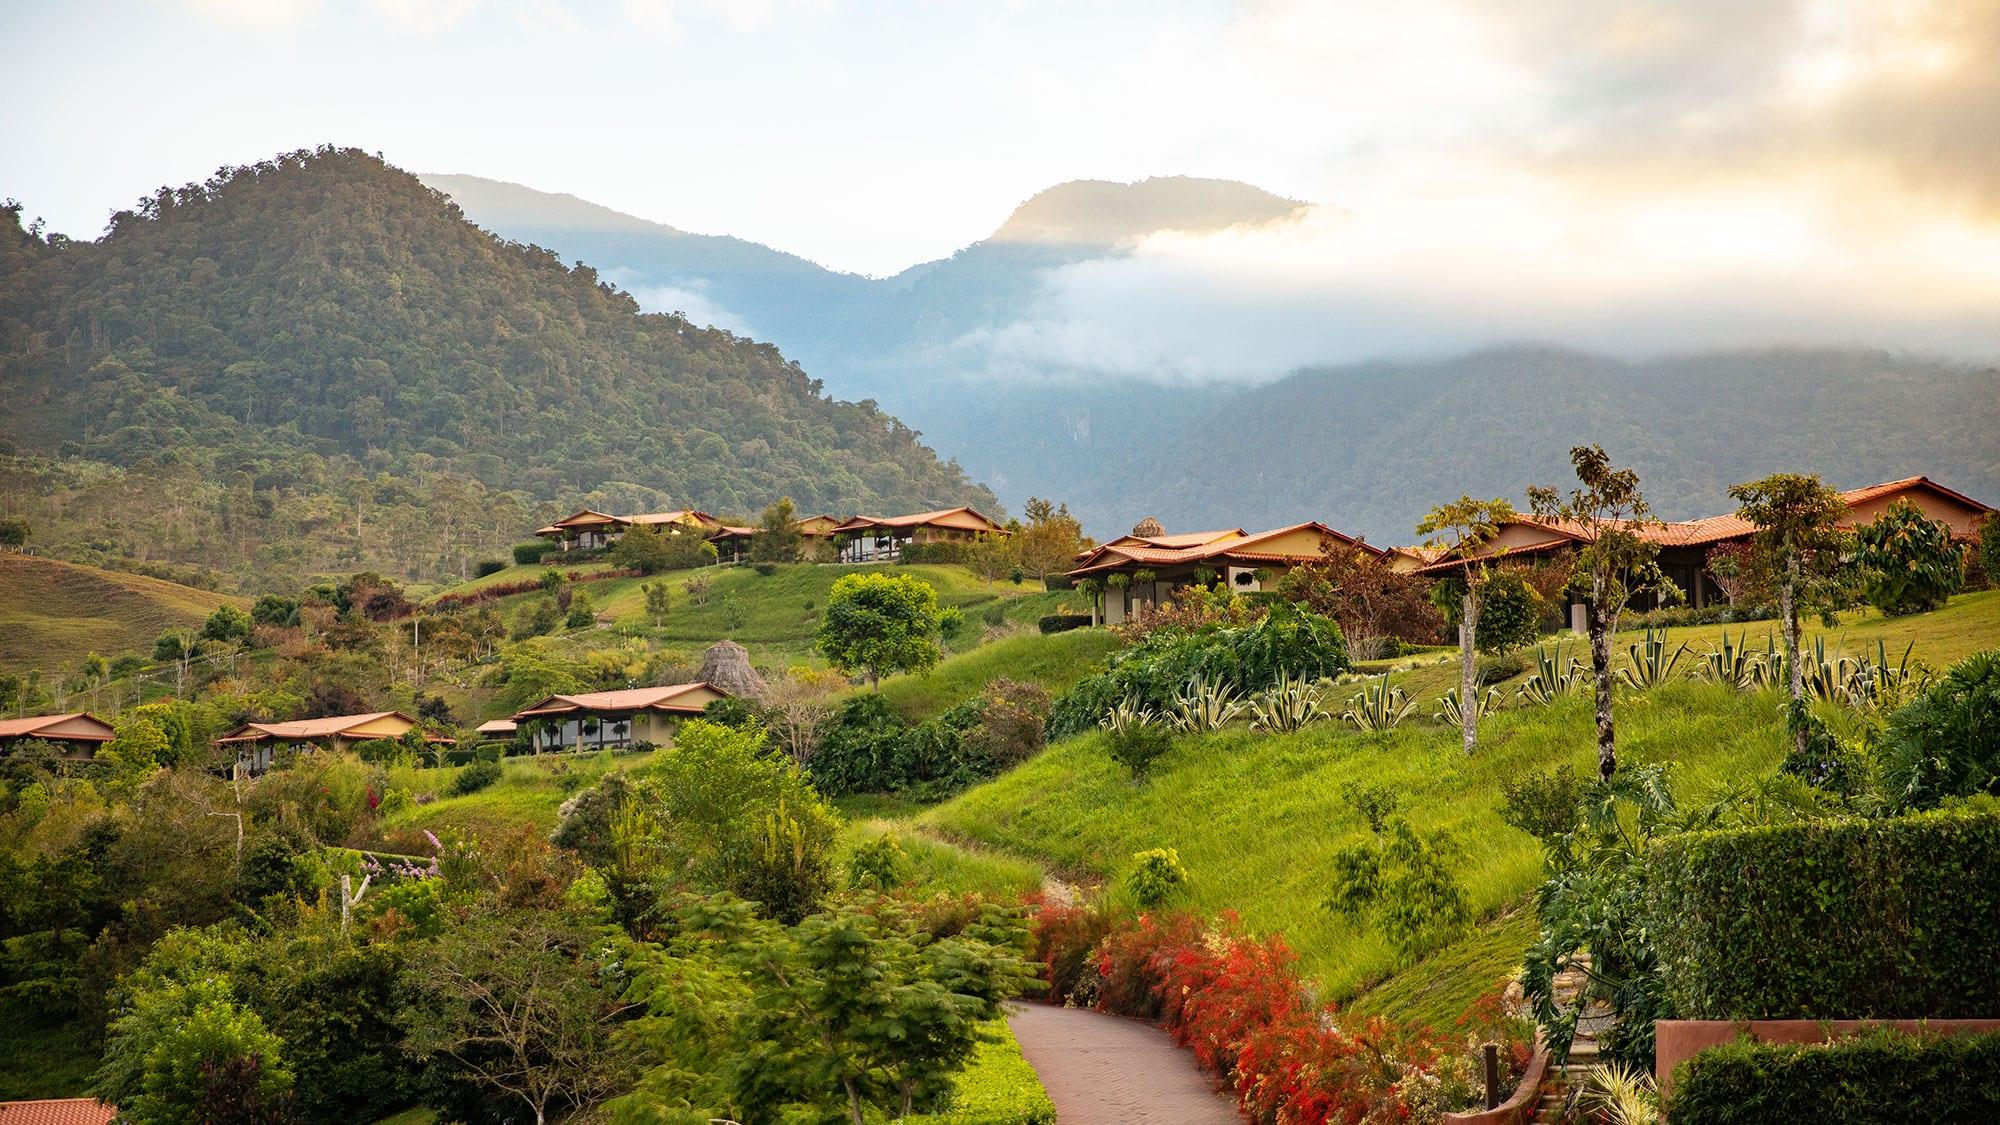 view of hacienda altagracia landscape